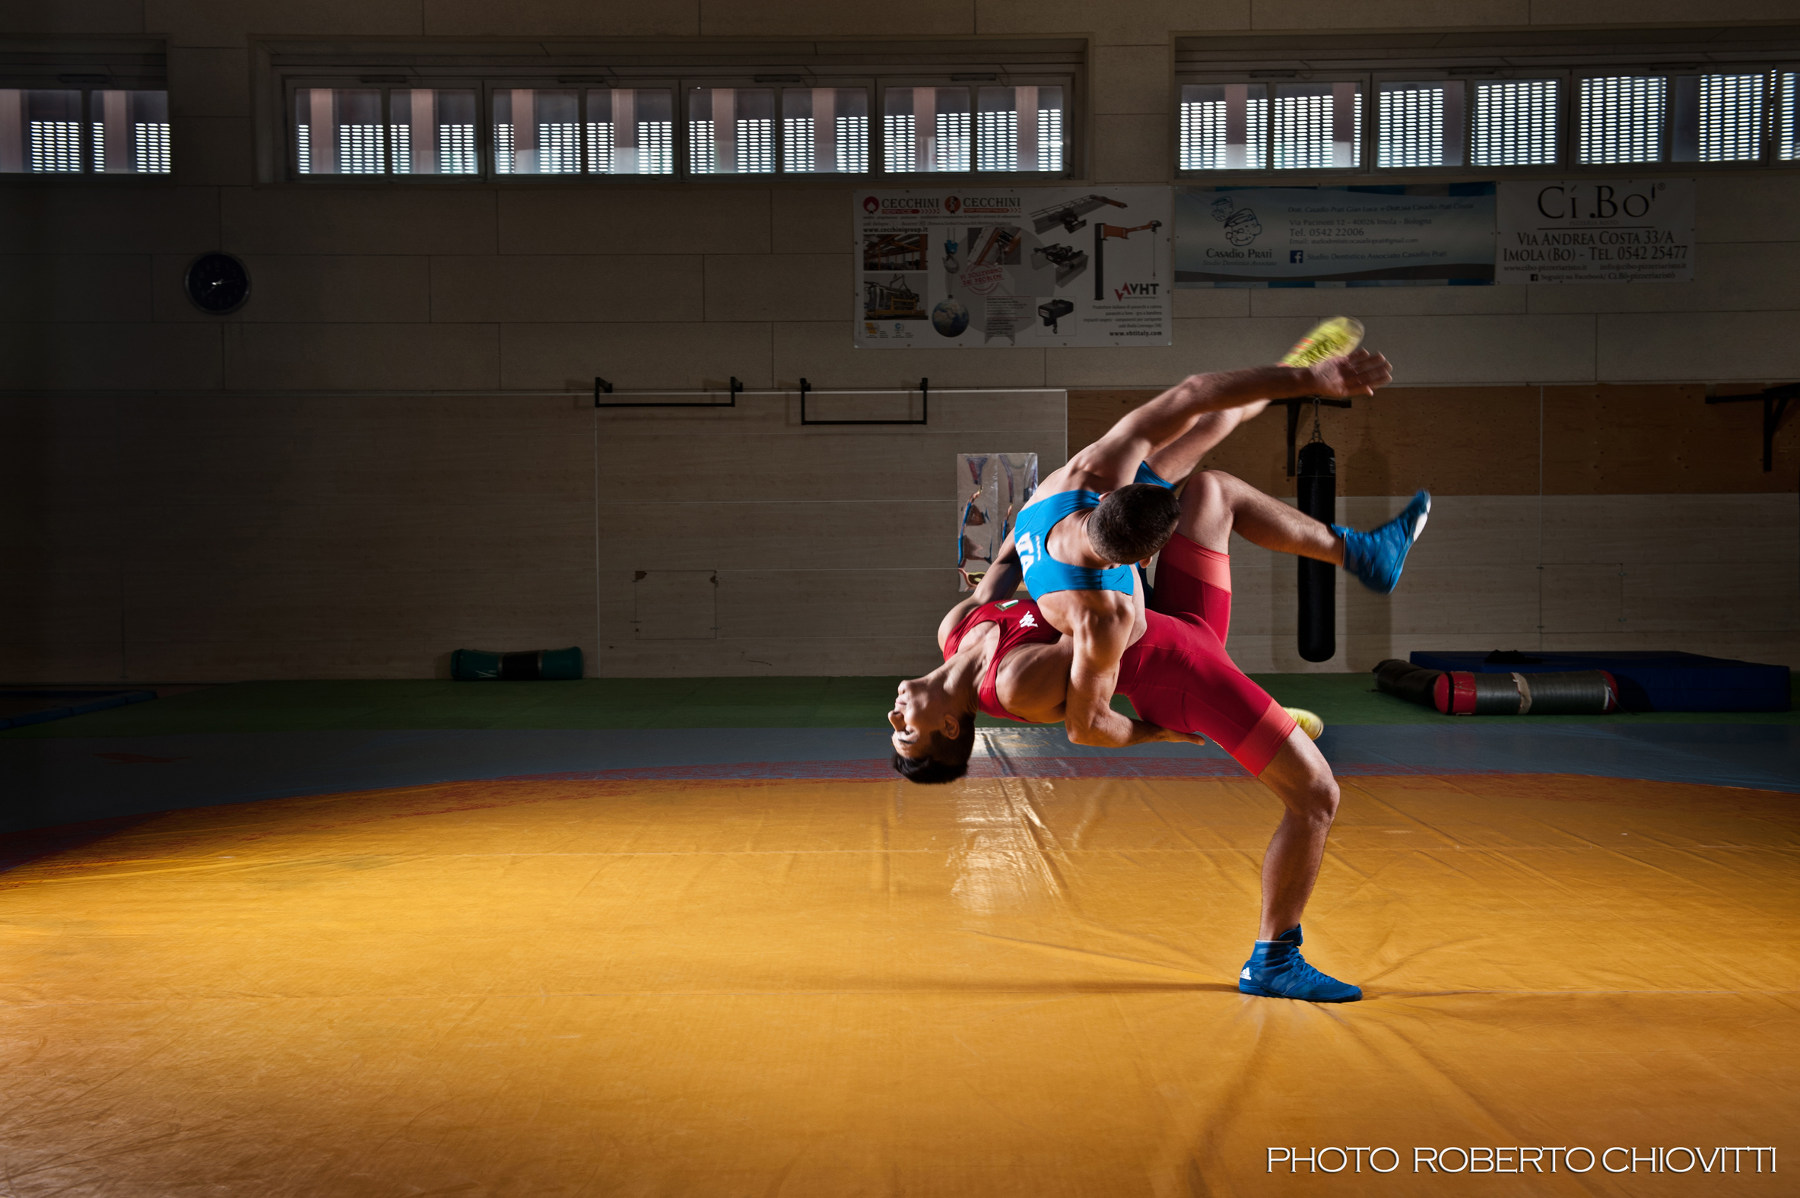 U.S.I.L. - Unione Sportiva Lotta Imolese